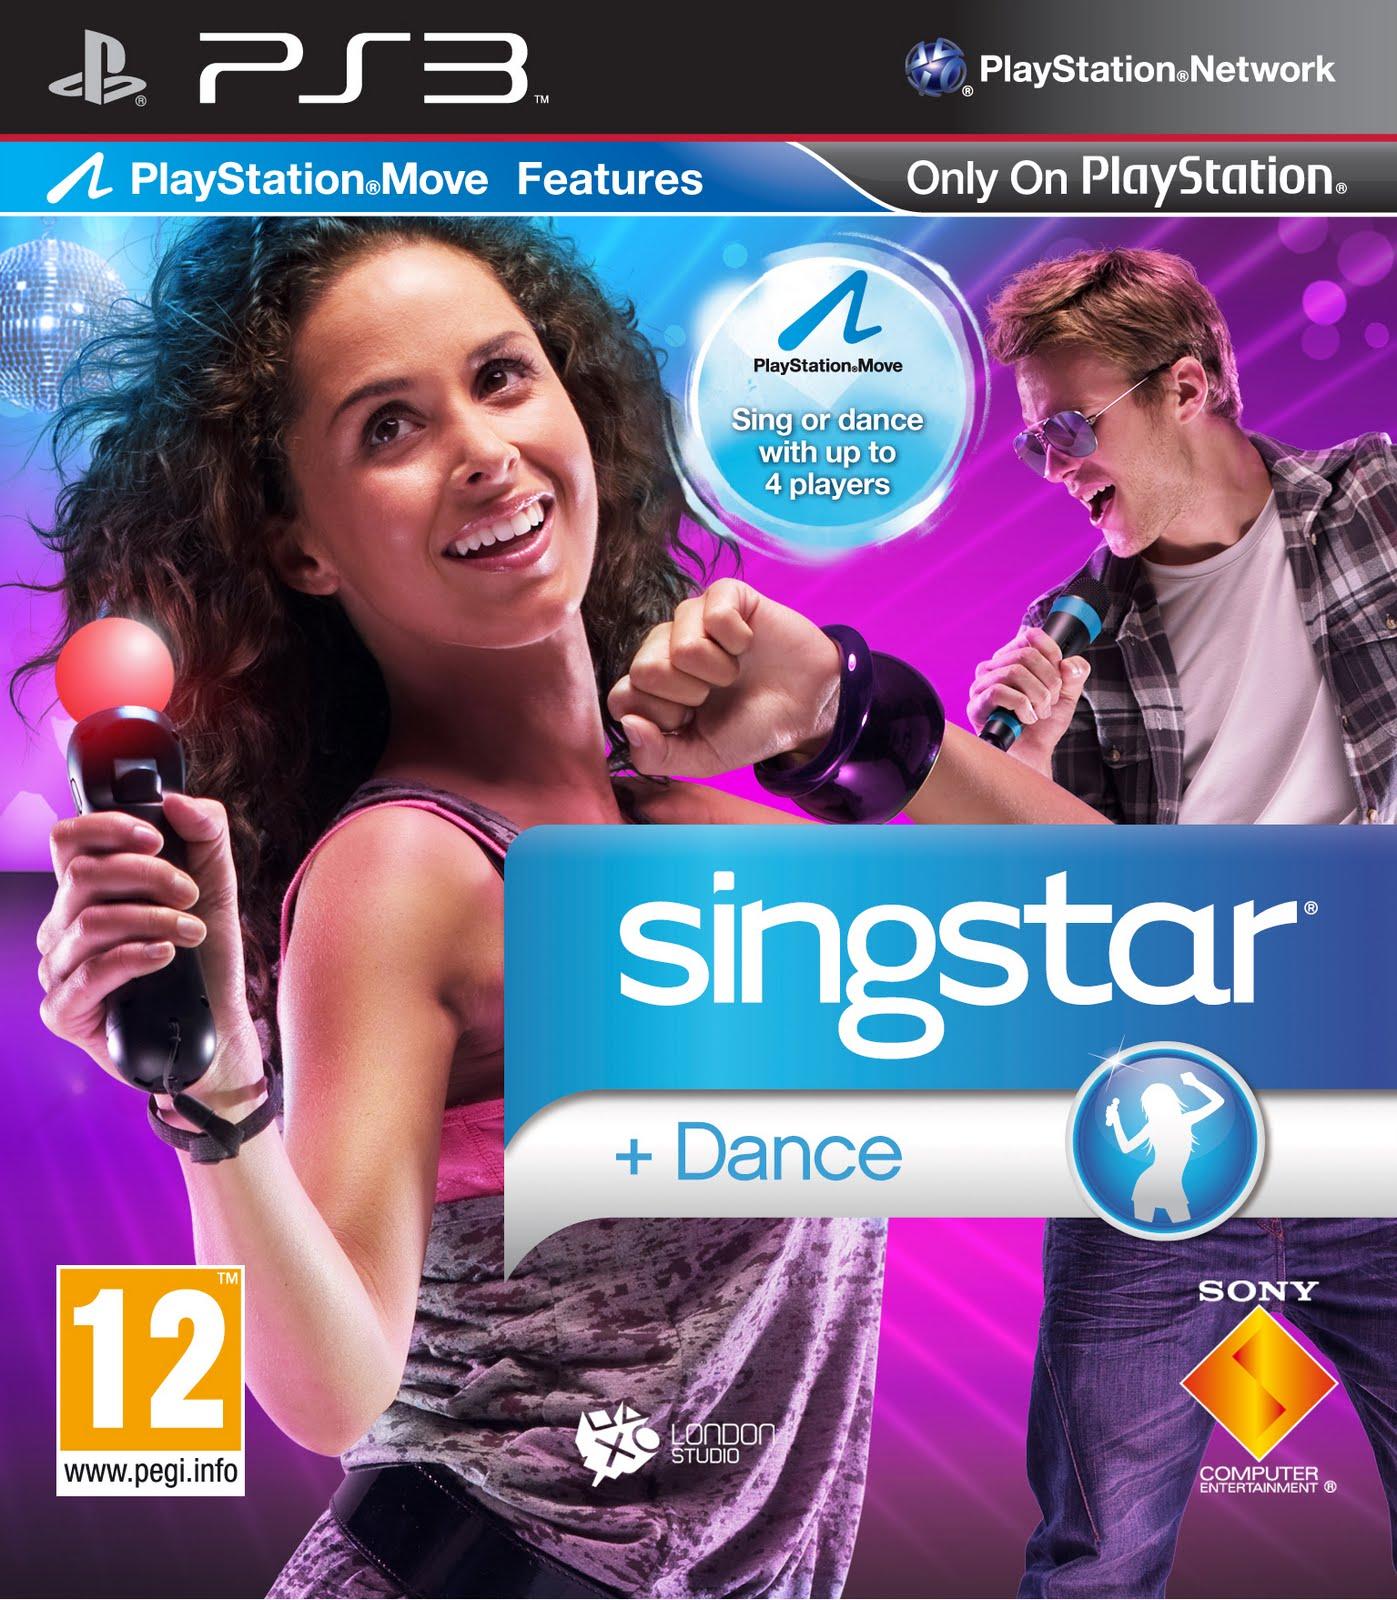 http://1.bp.blogspot.com/_dzJVCMGZIBE/TG2L61WikhI/AAAAAAAA_Fo/lJmBjK74yyA/s1600/8833SingStar+Dance+2D+Packshot+PEGI+12%2B.jpg